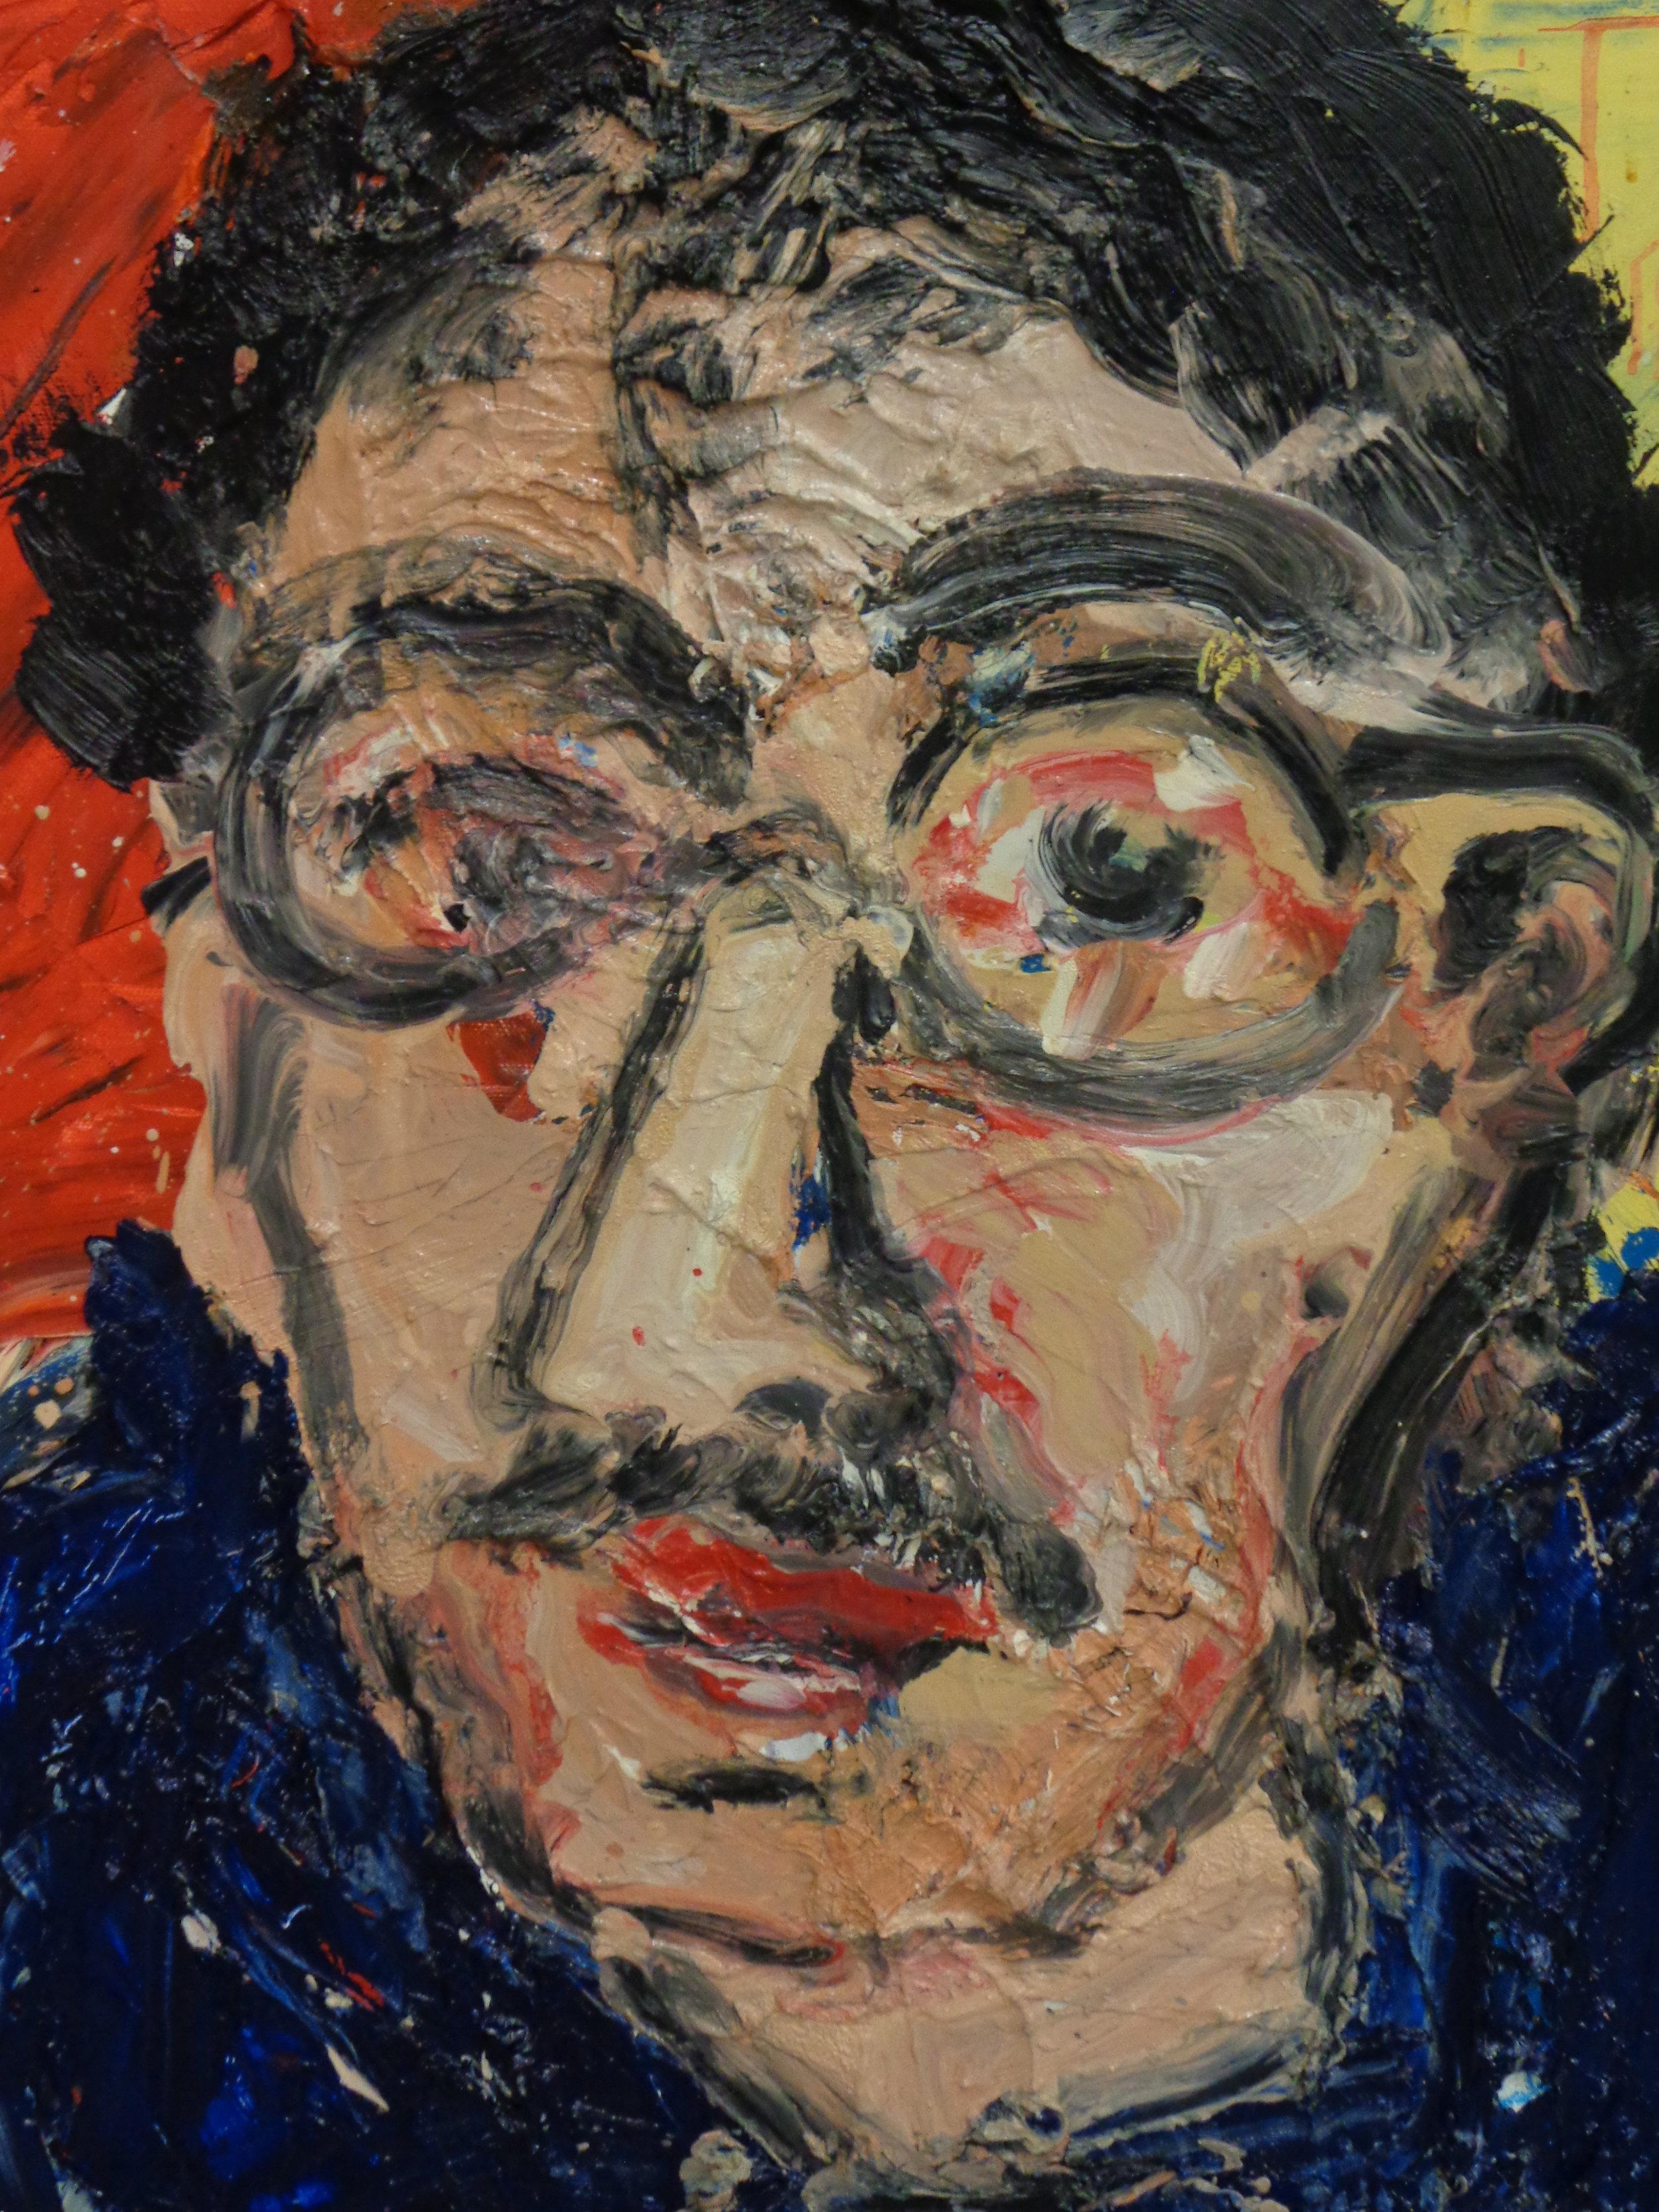 Robert Bianchi - oil on canvas 24